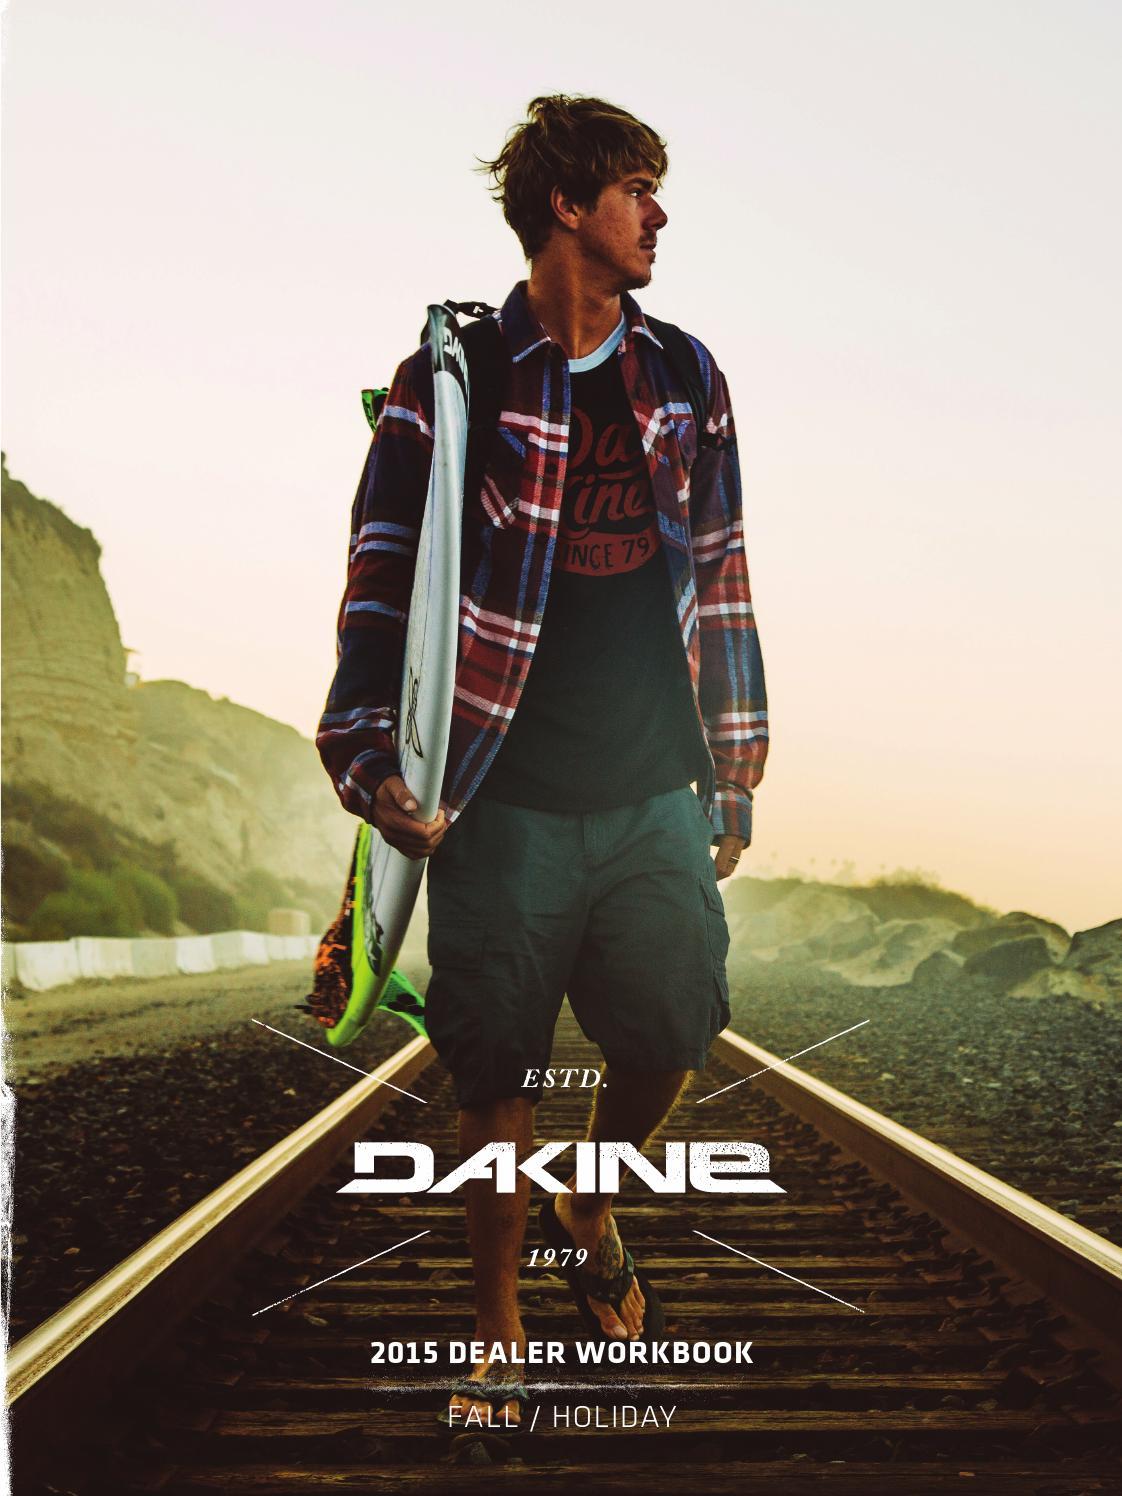 Dakine Men/'s XXL Long Sleeve Covert Snug Fit Rash Guard Black Surf Shirt NWT